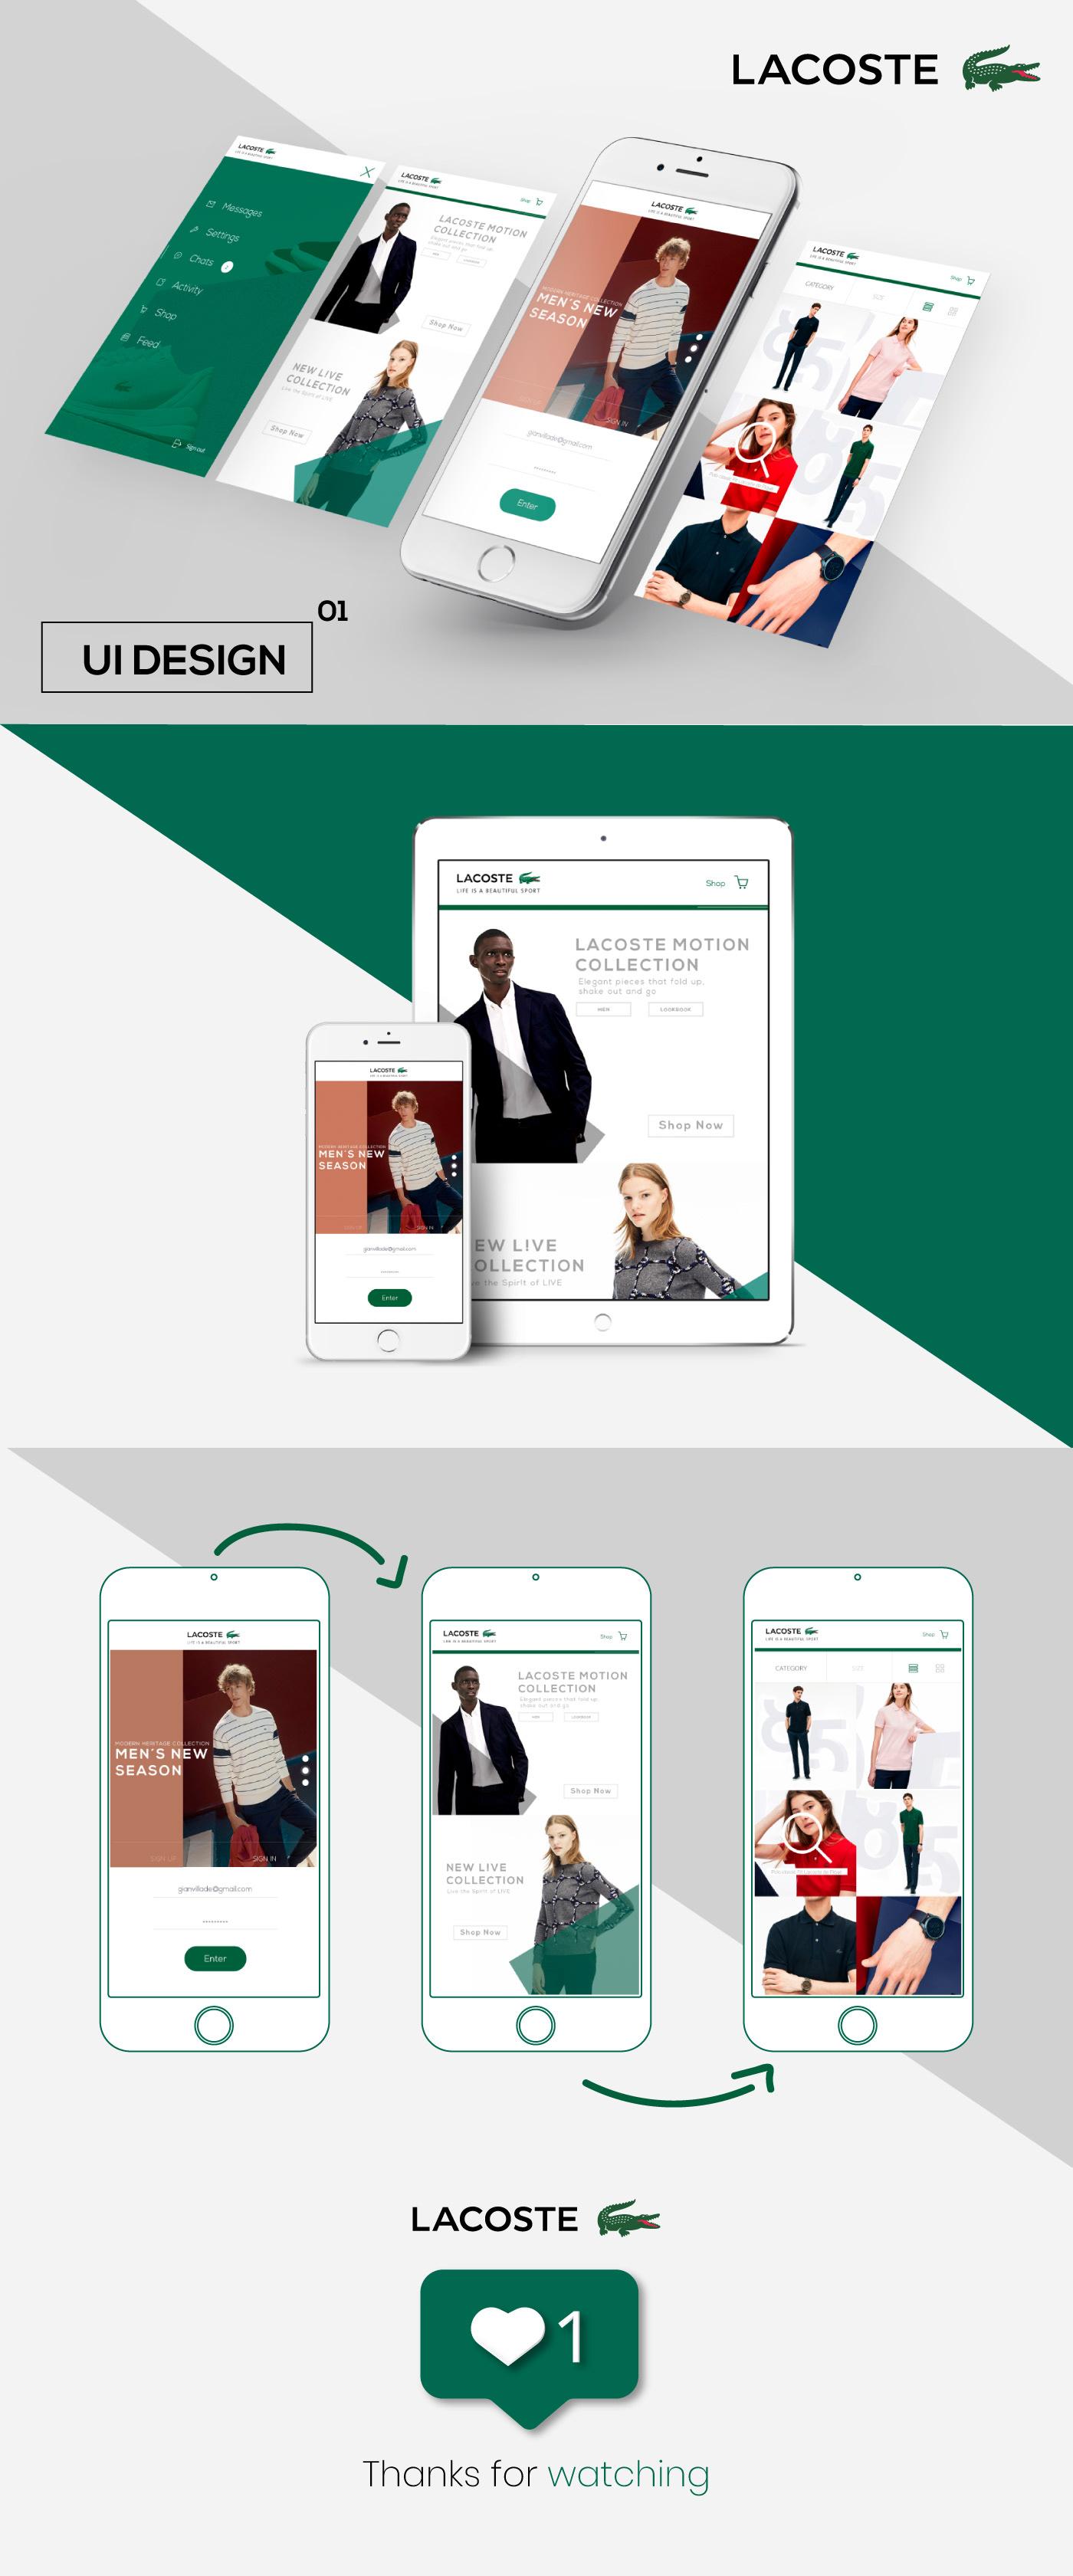 Interface design art direction  ux/ui uidesign app design lacoste interaction